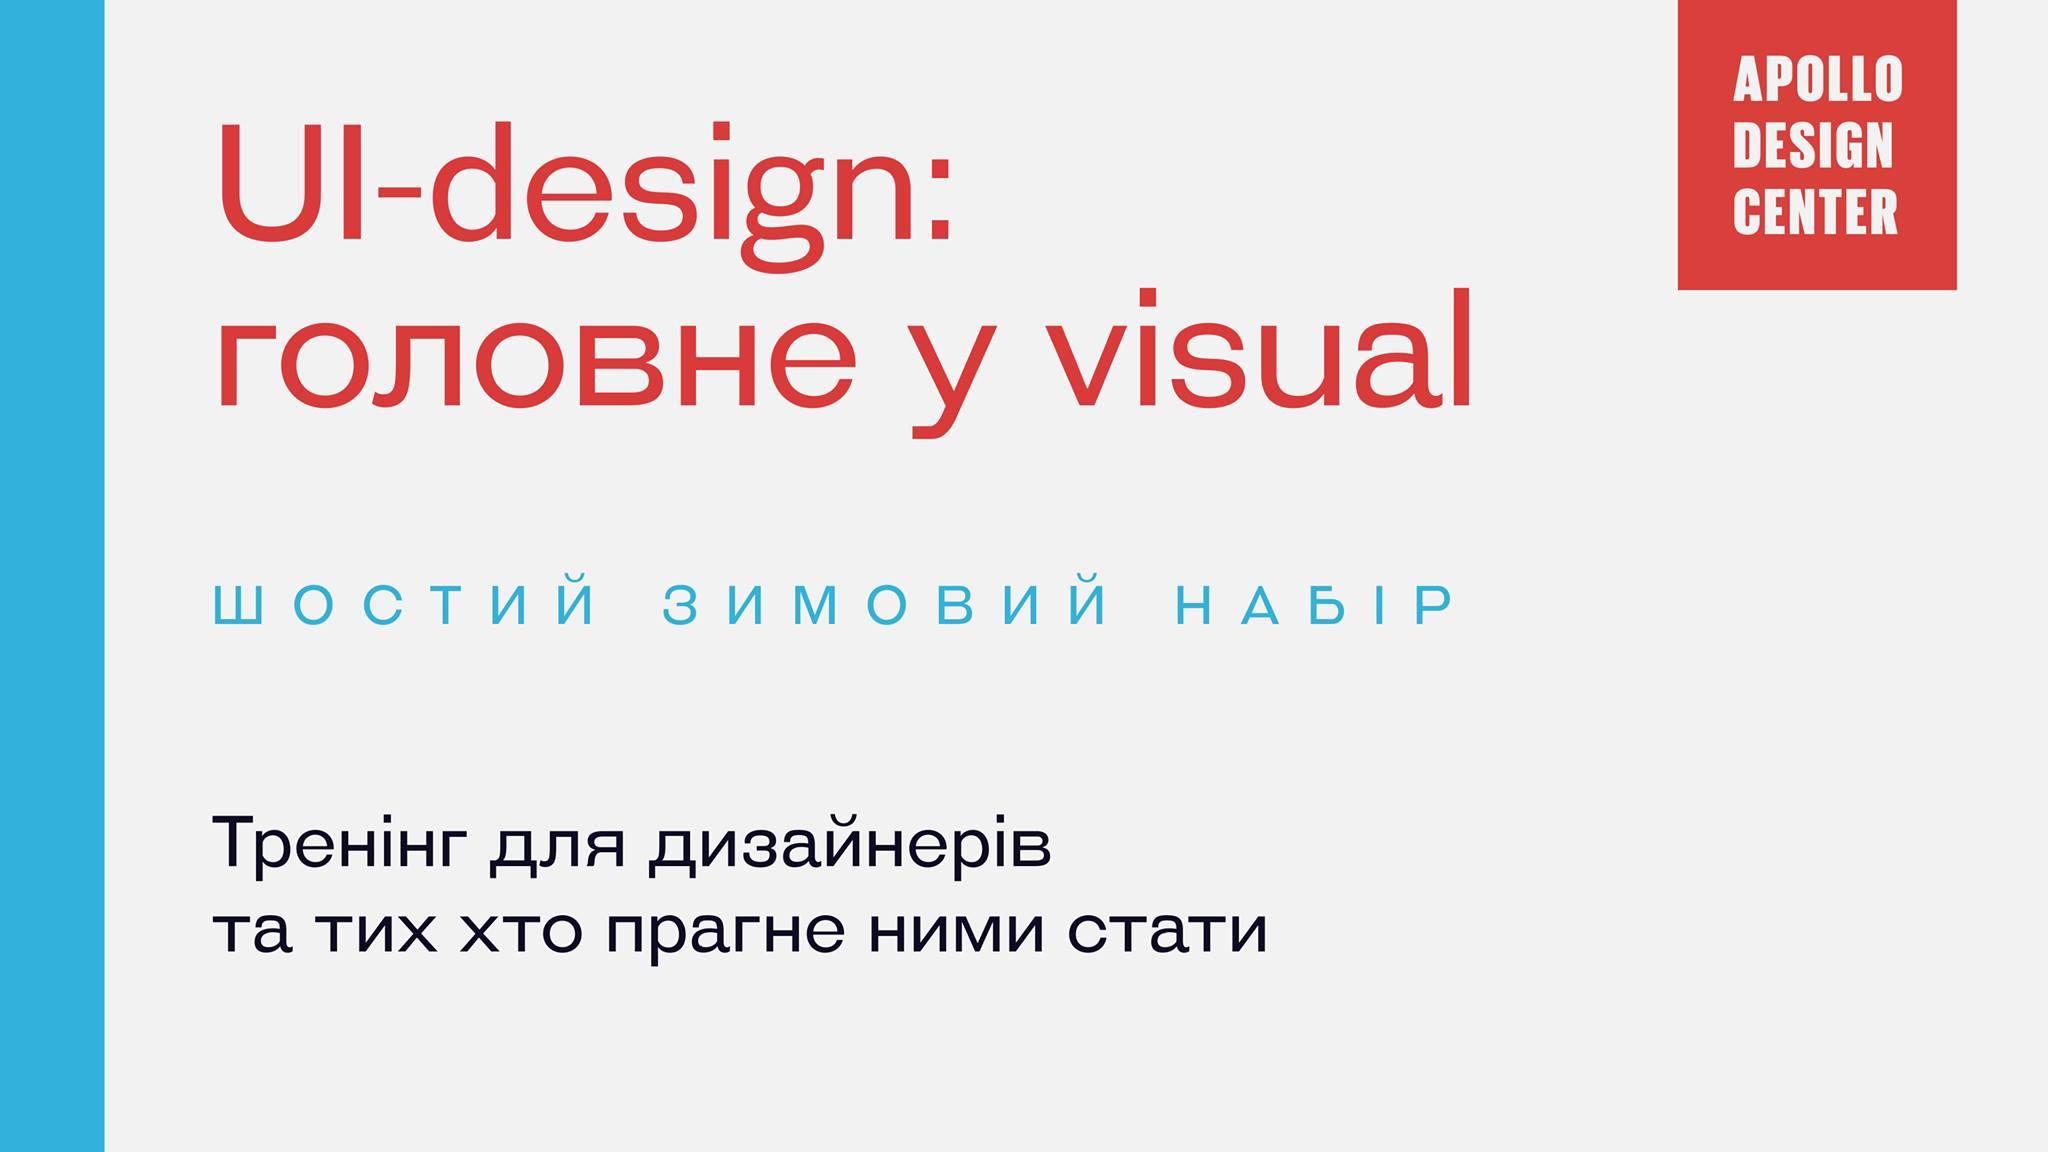 Тренінг UI-дизайн: основи Visual